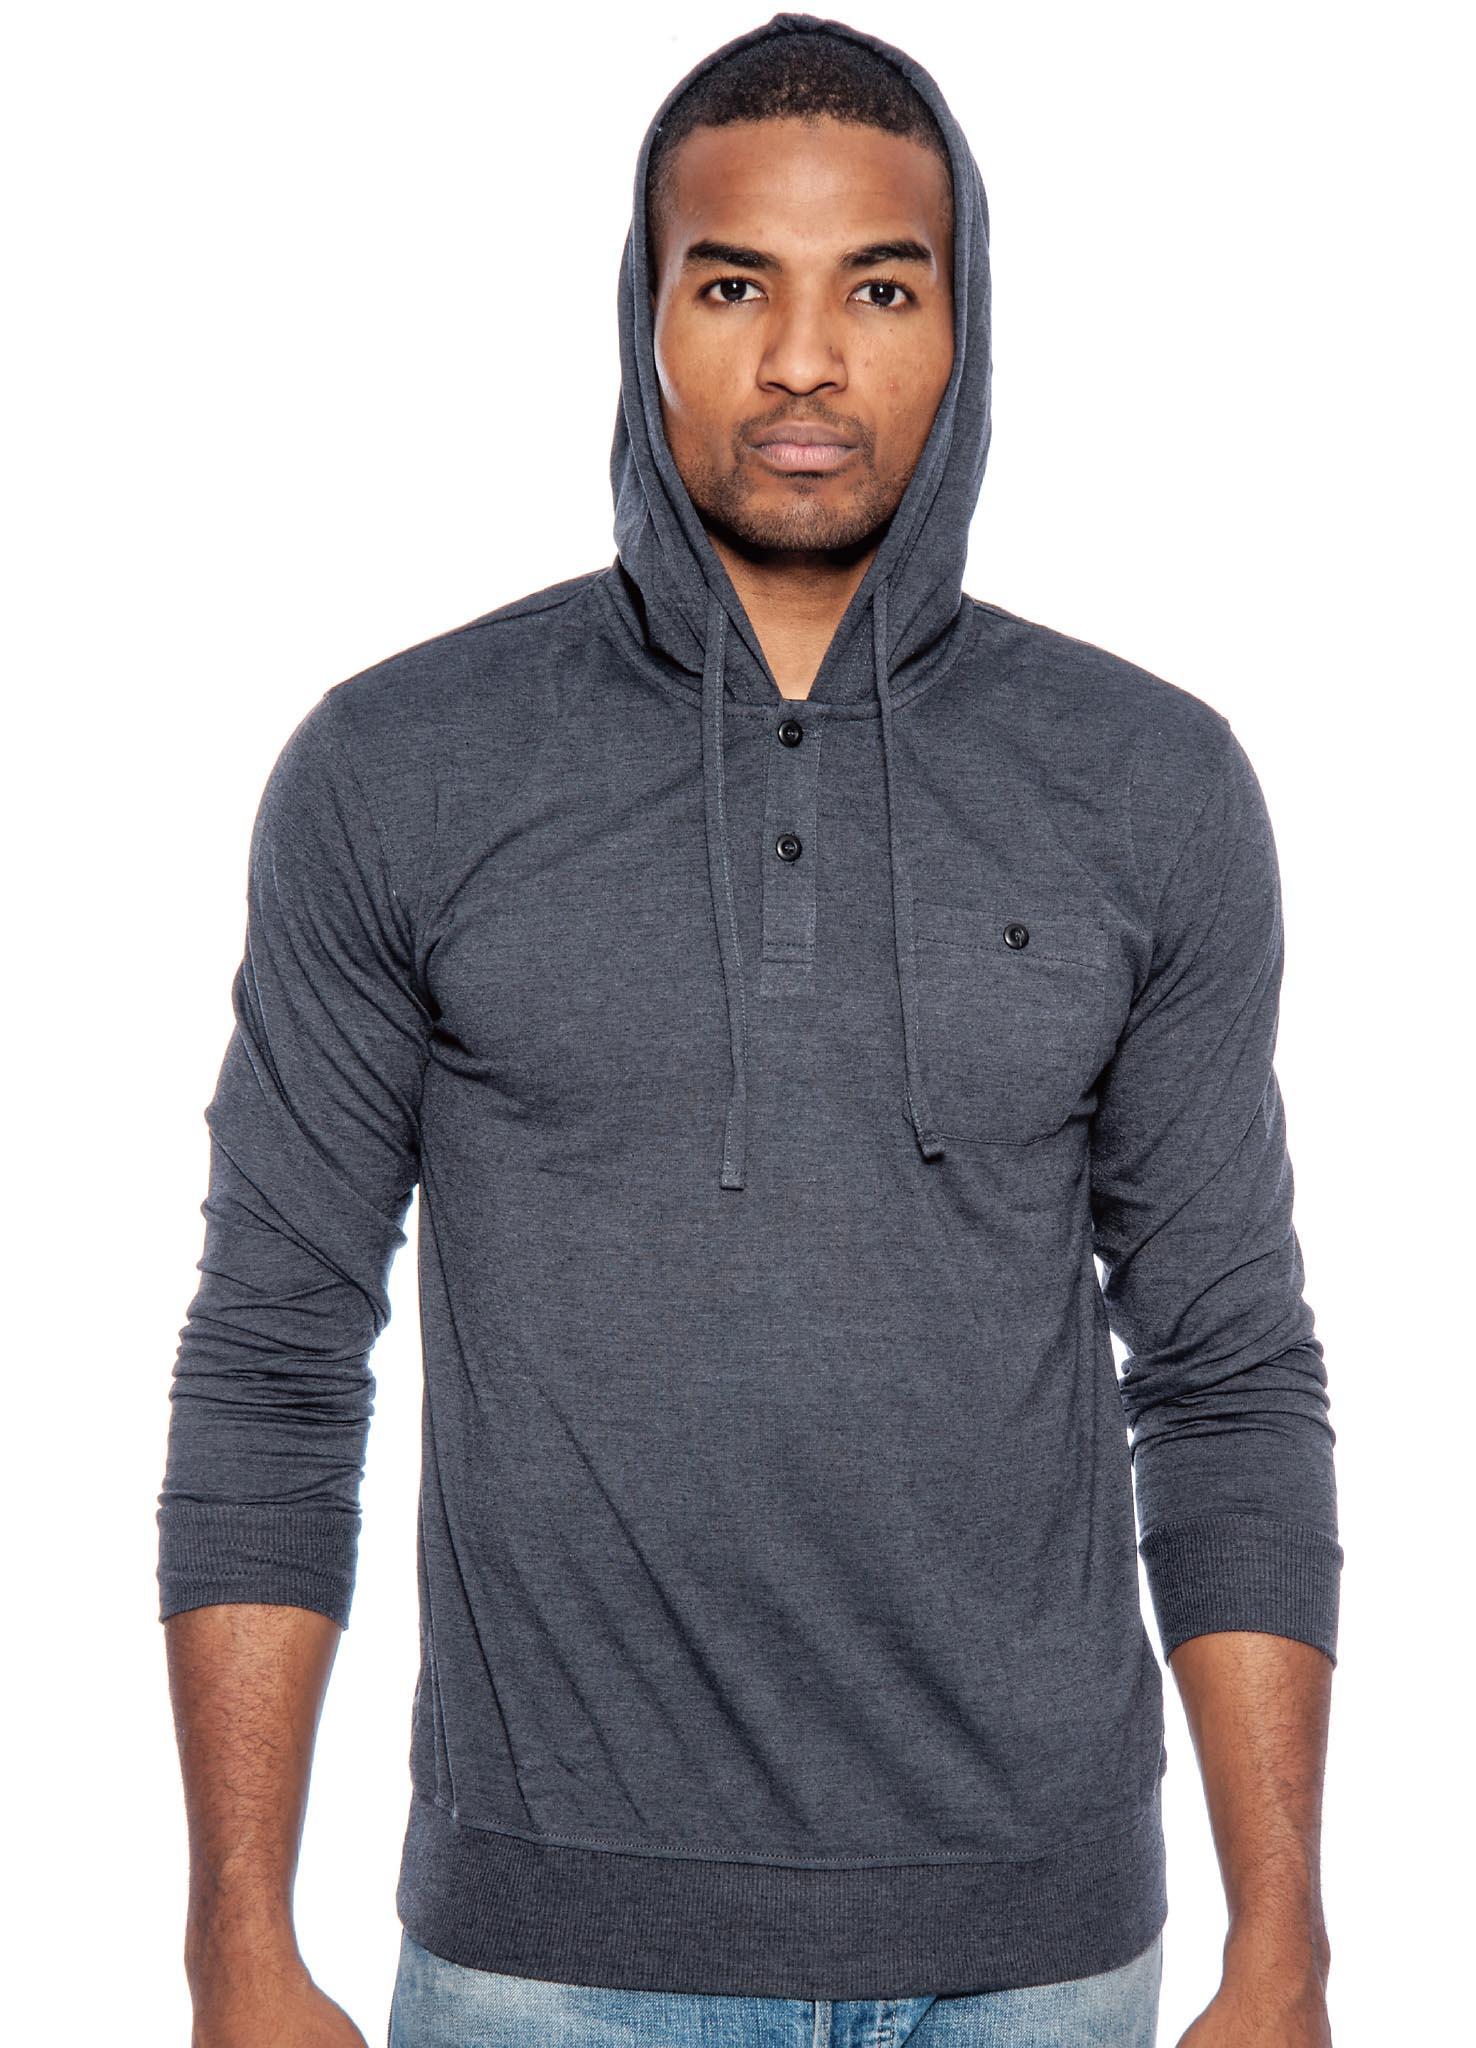 Lightweight hoodie pullover